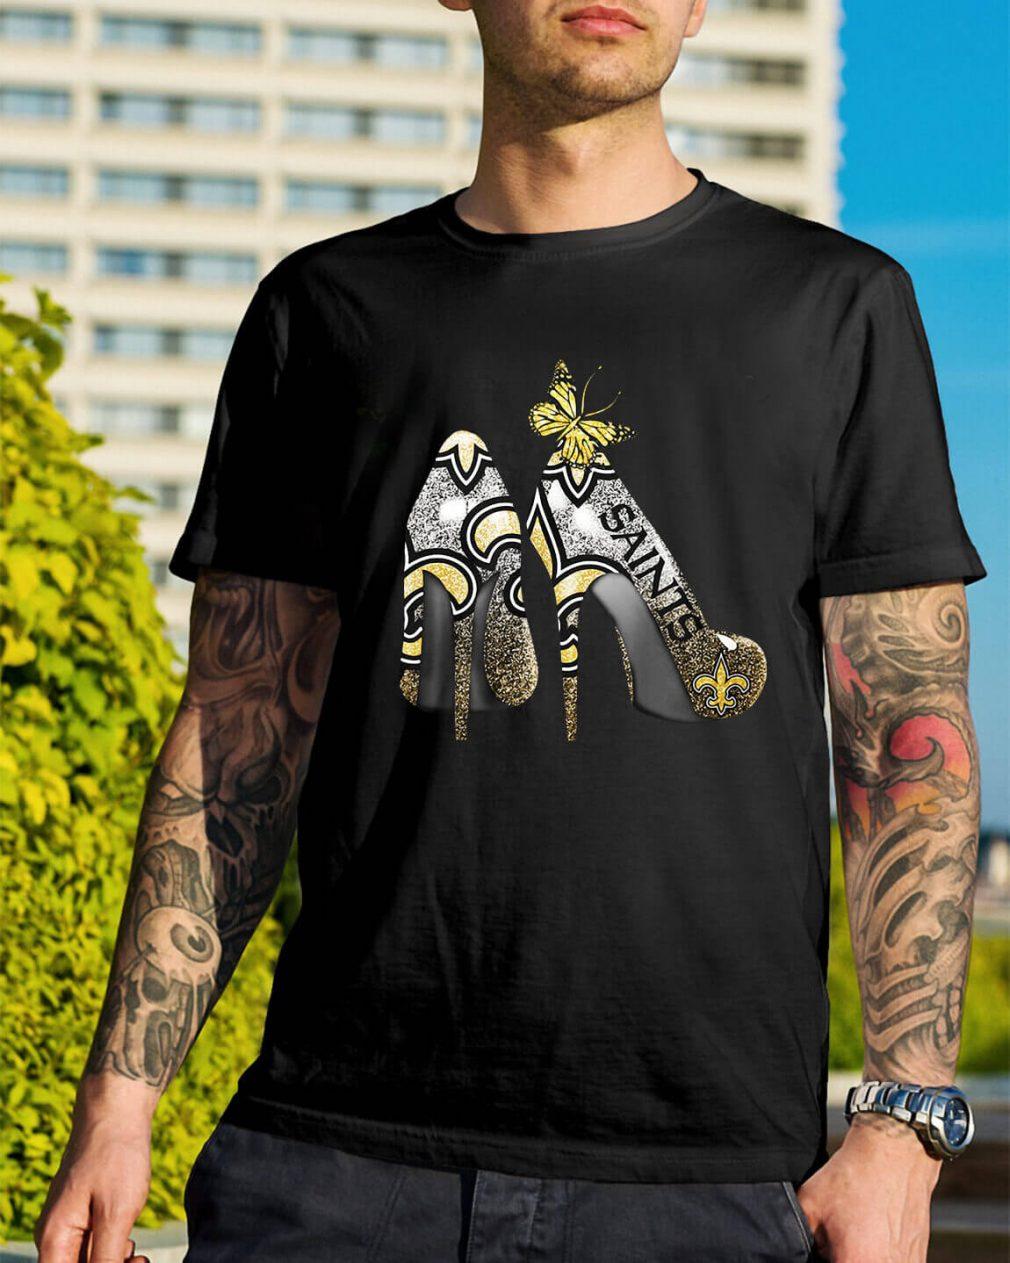 New Orleans Saints Heels high heels shirt